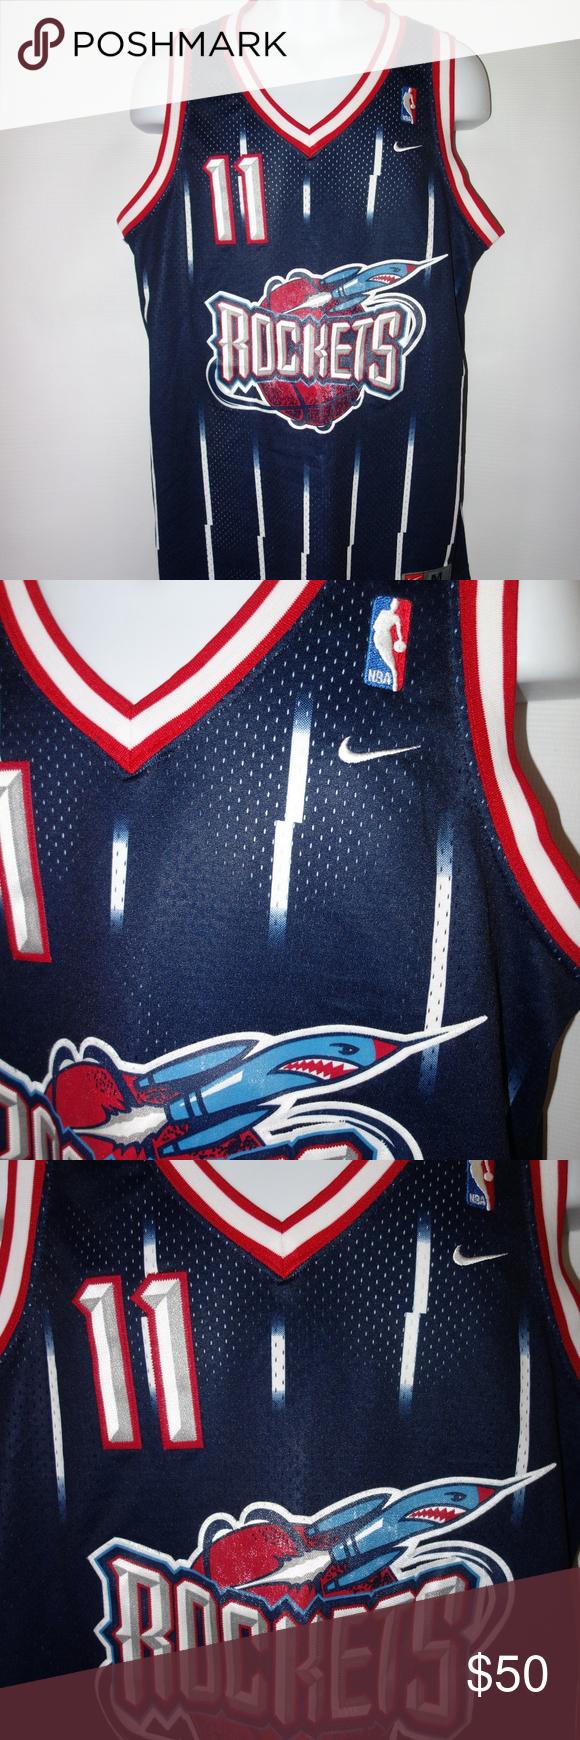 premium selection 8da2b 1de36 Nike Houston Rockets Yao Ming Jersey #11 M Blue Nike Houston ...